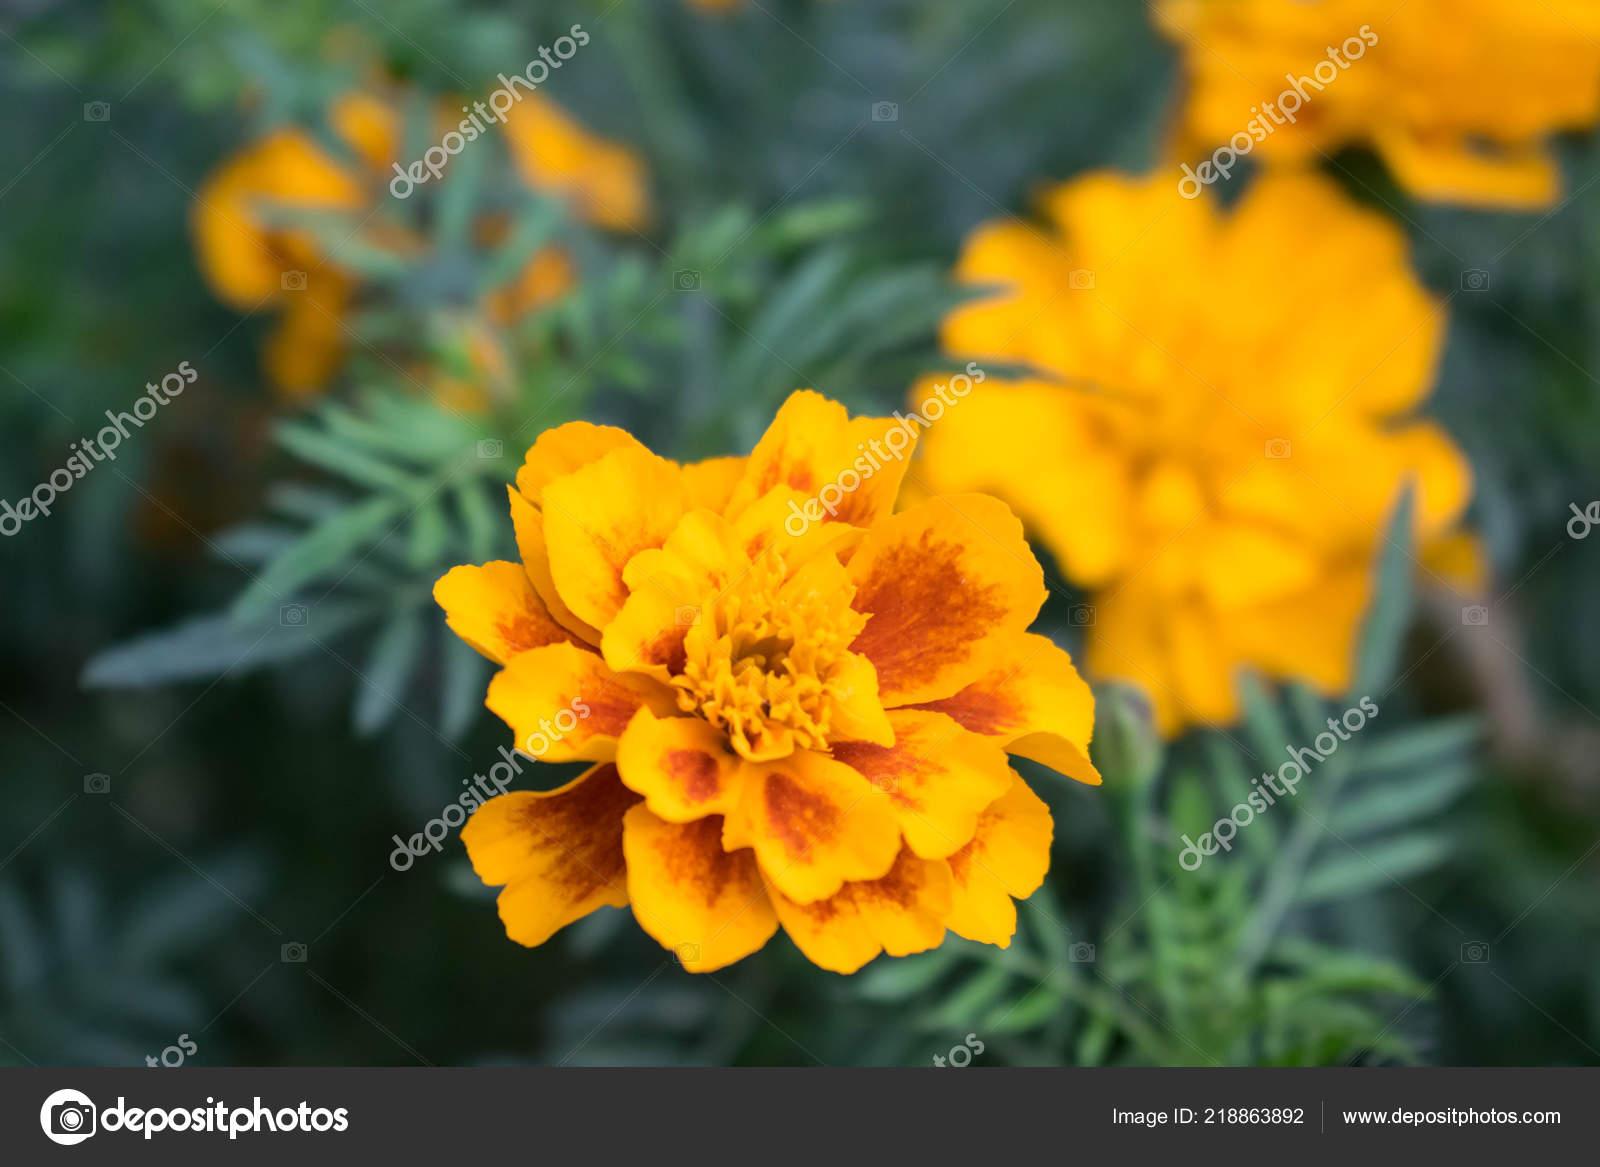 Yellow Flowers Daisies Marigolds Grow Garden Autumn